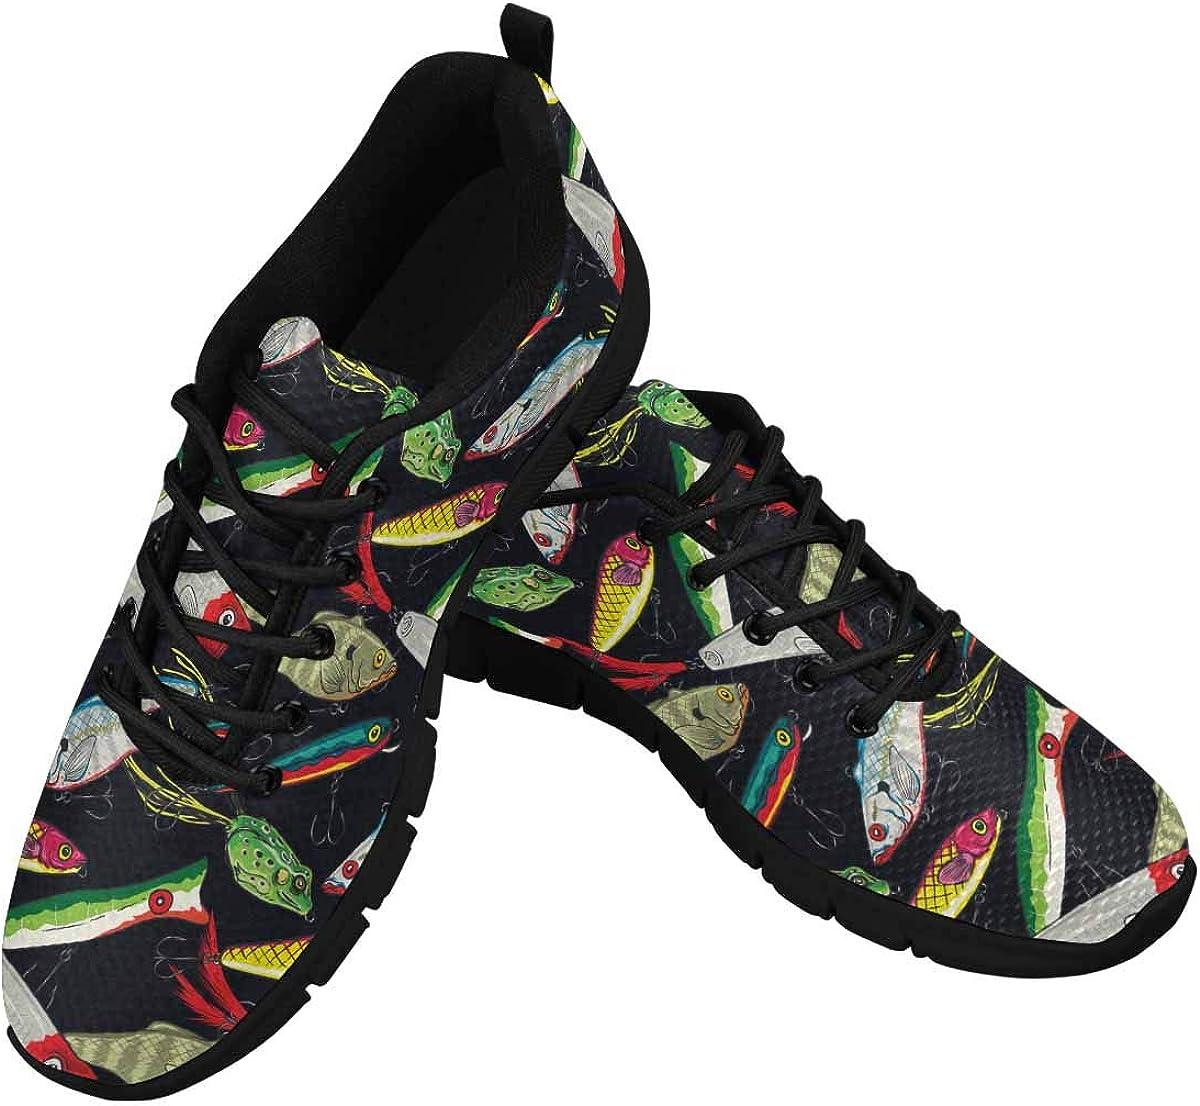 INTERESTPRINT Fishing Bait Print Women's Walking Shoes Lightweight Casual Running Sneakers